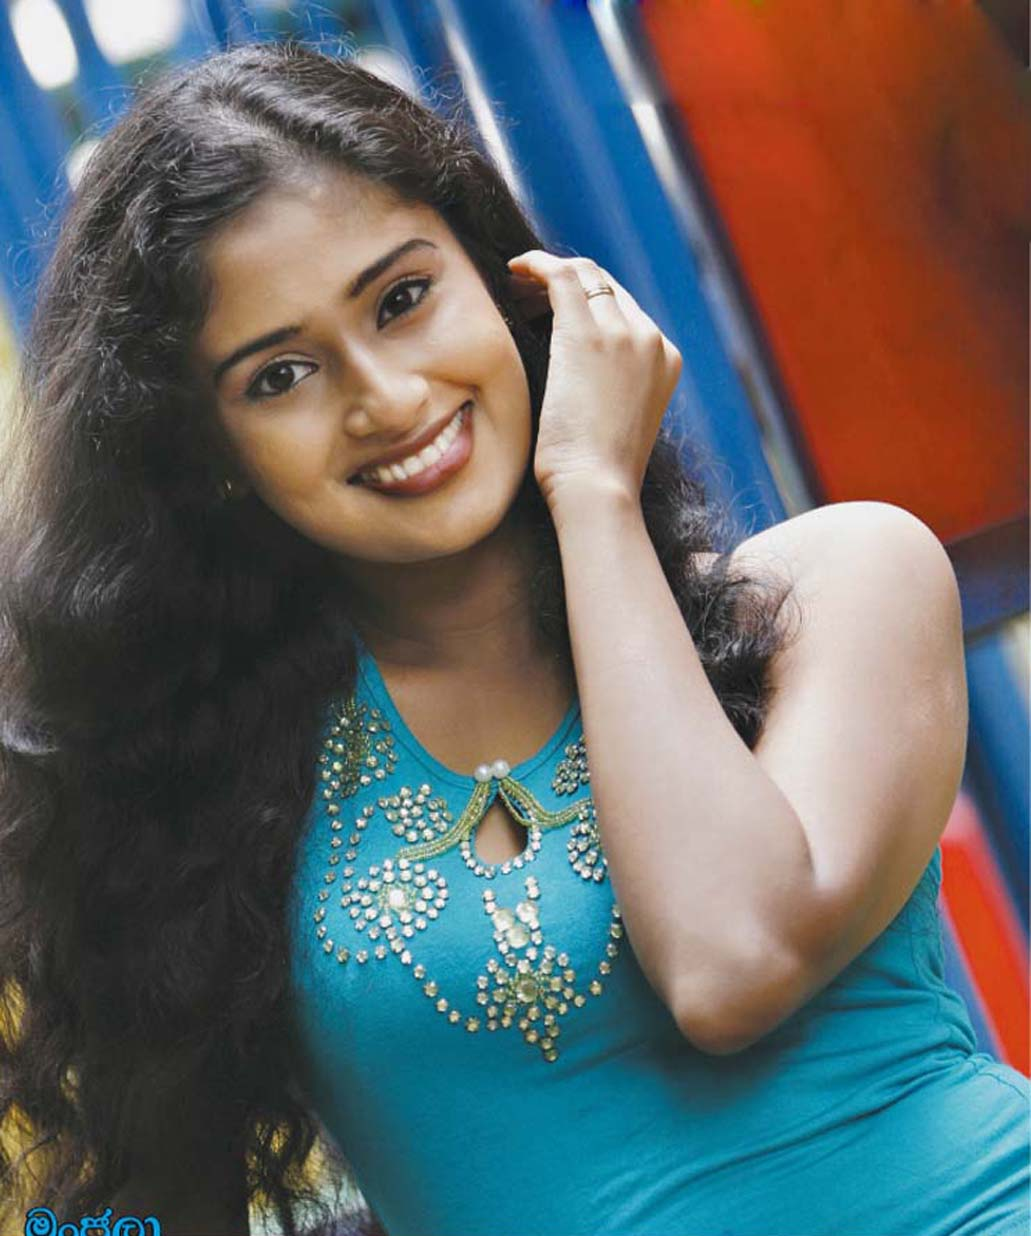 Sri lanka girl ane epaaaa 1